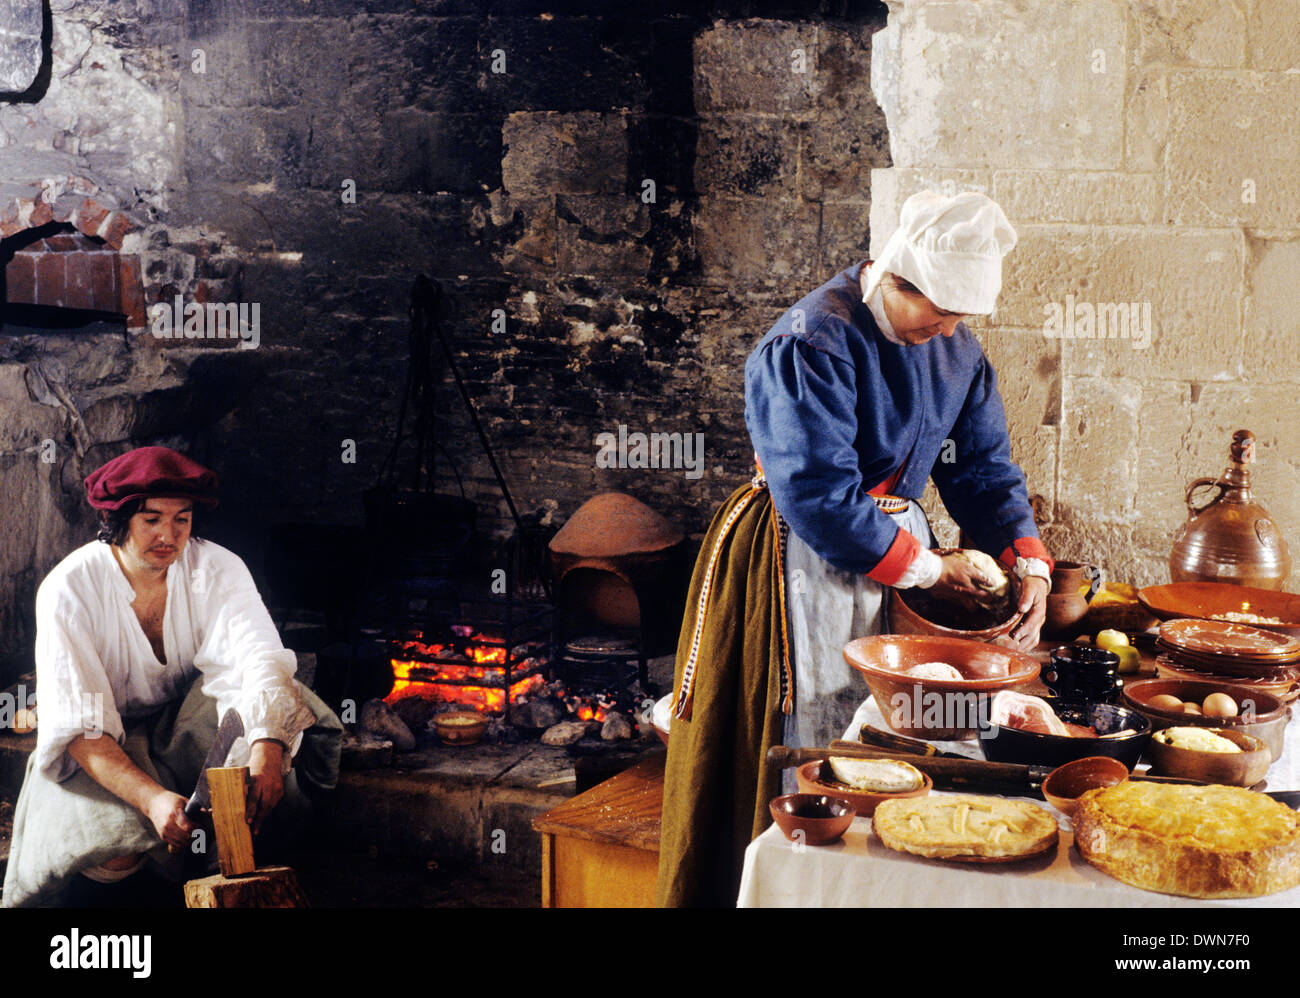 Tudor Periode Küche, Ende des 16. Jahrhunderts Reenactment Frau bereitet Essen Mann Feuer Kostüme Kostüm Stockbild